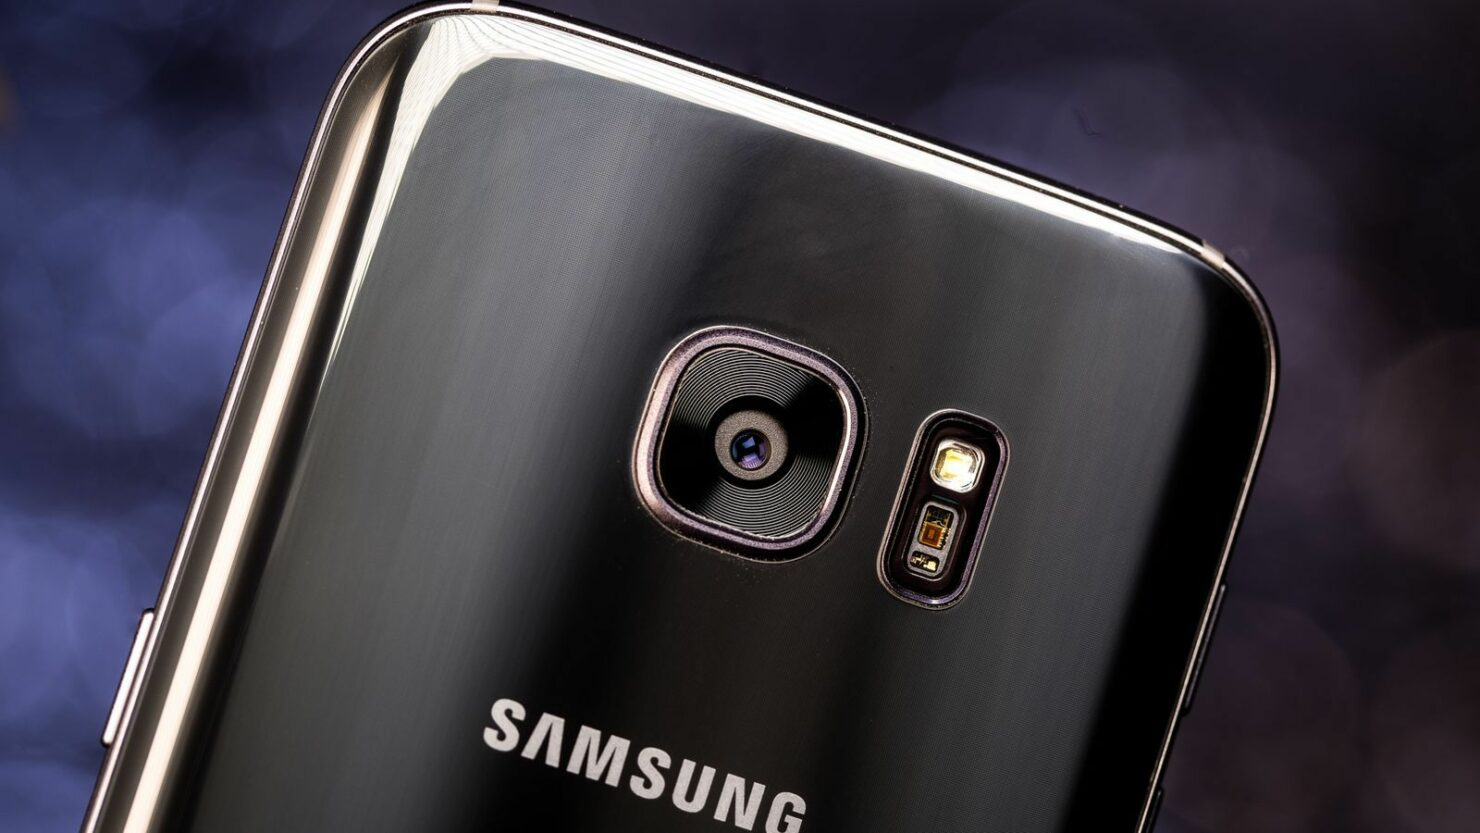 Samsung job title confirms AI assistant Galaxy S8